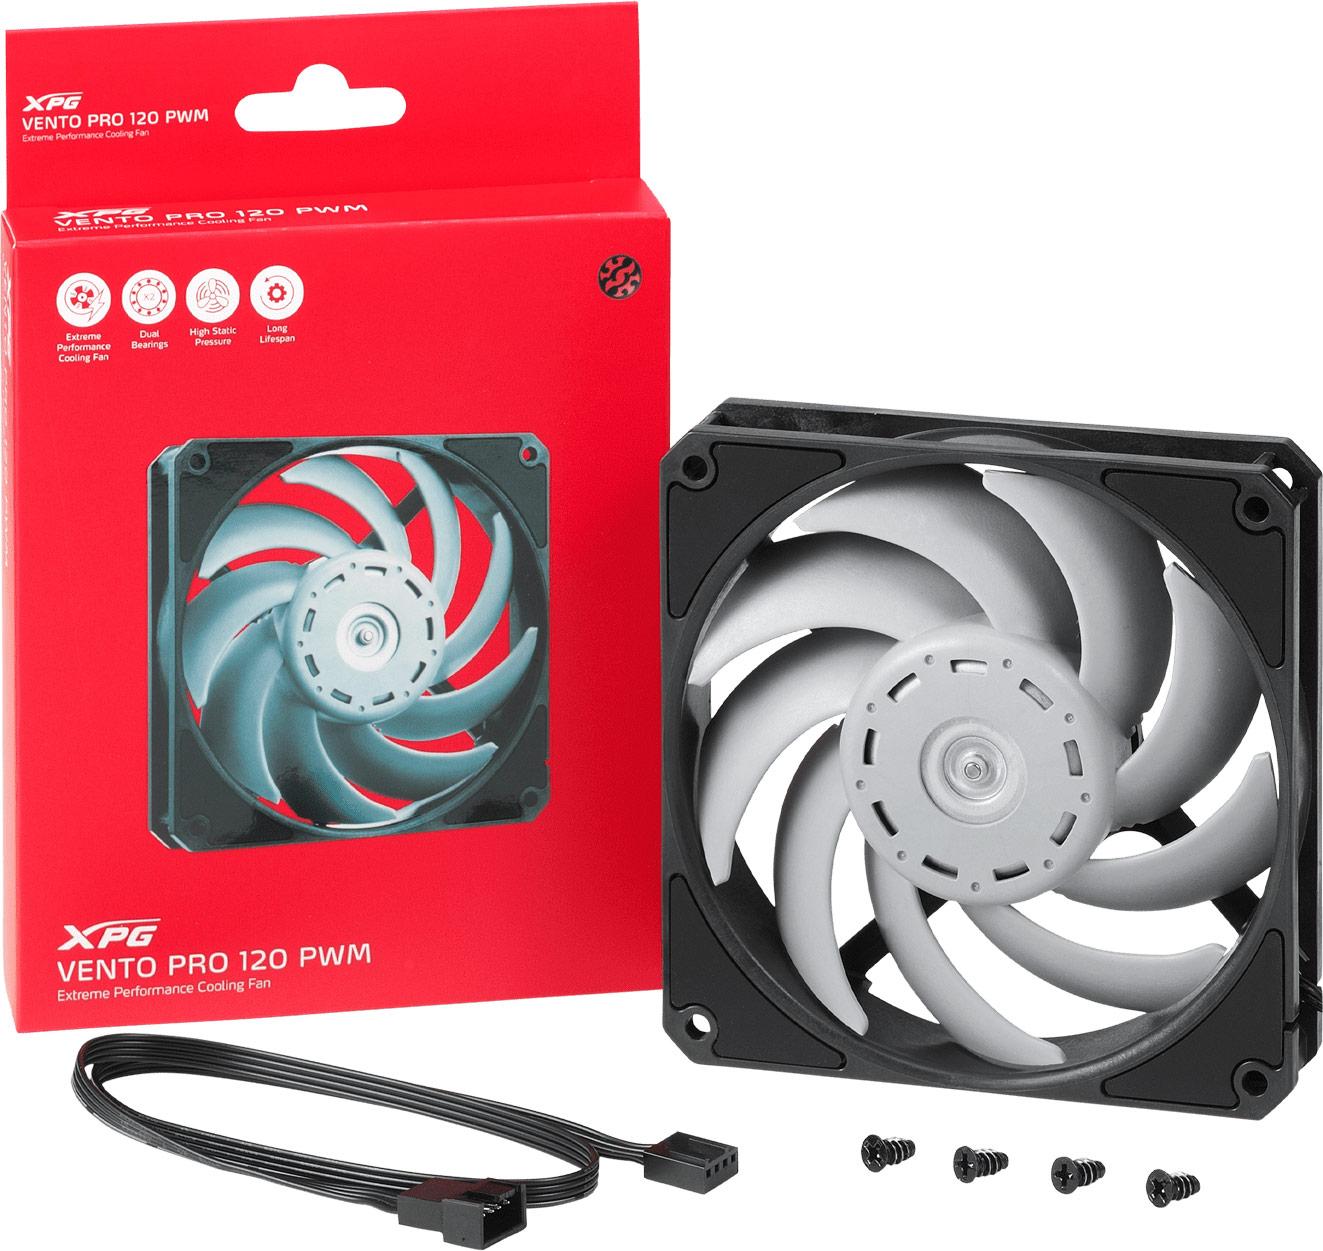 вентилятор XPG Vento Pro 120 PWM